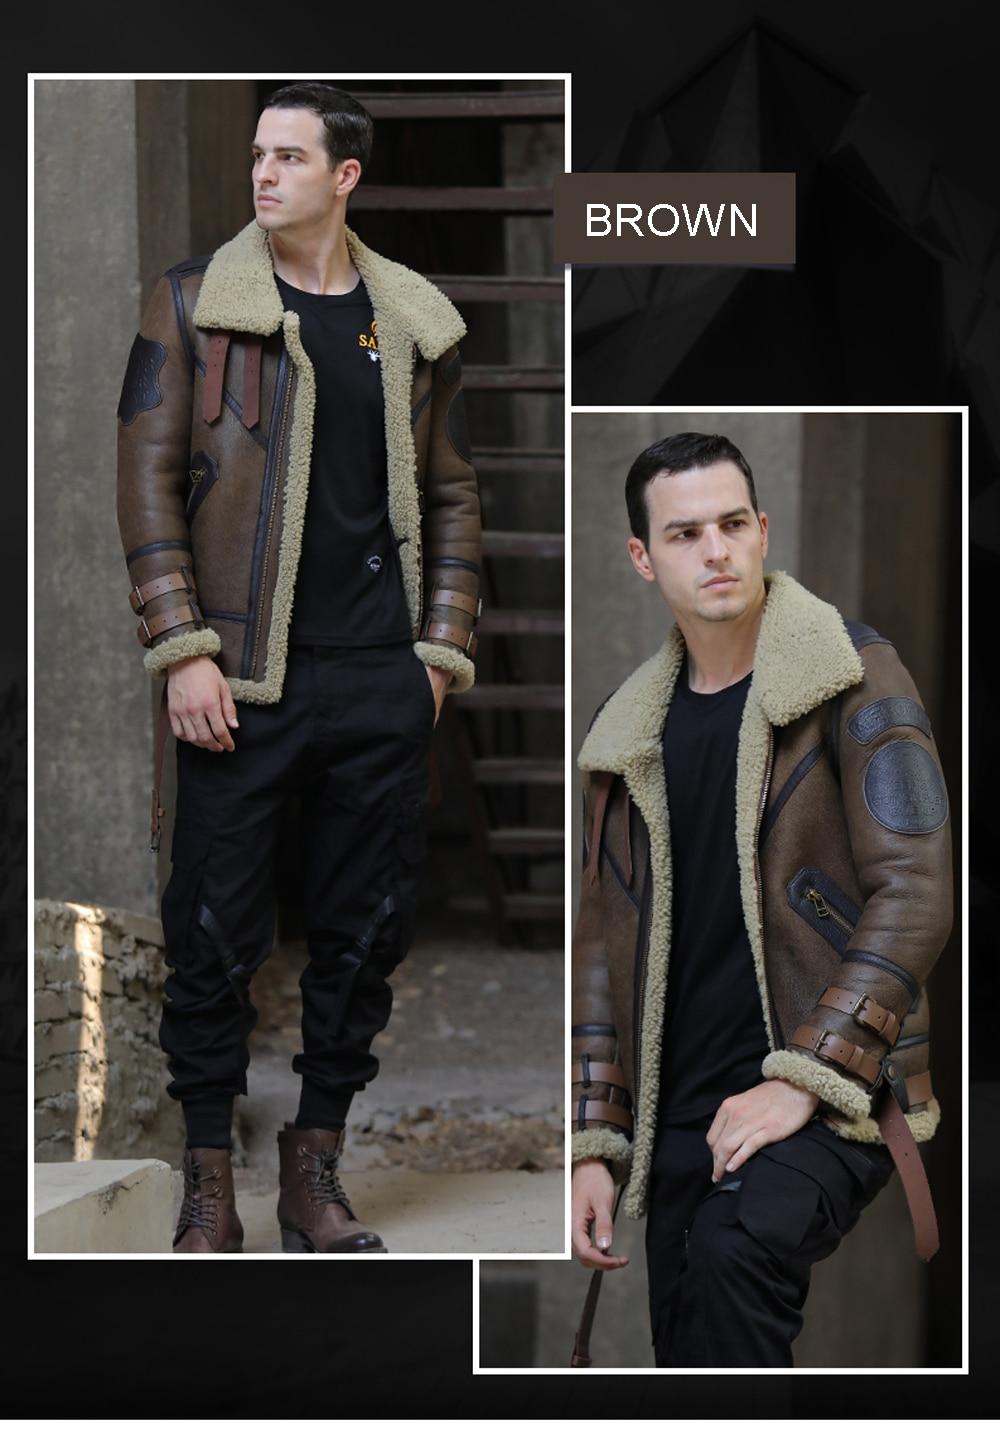 H8ded99d27df44e6b9dbf80cee7b56dabh 2019 Fashion 100% Quality Real Sheepskin Fur Men Coat Genuine Full Pelt Sheep Shearling Male Winter Jacket Brown Men Fur Outwear